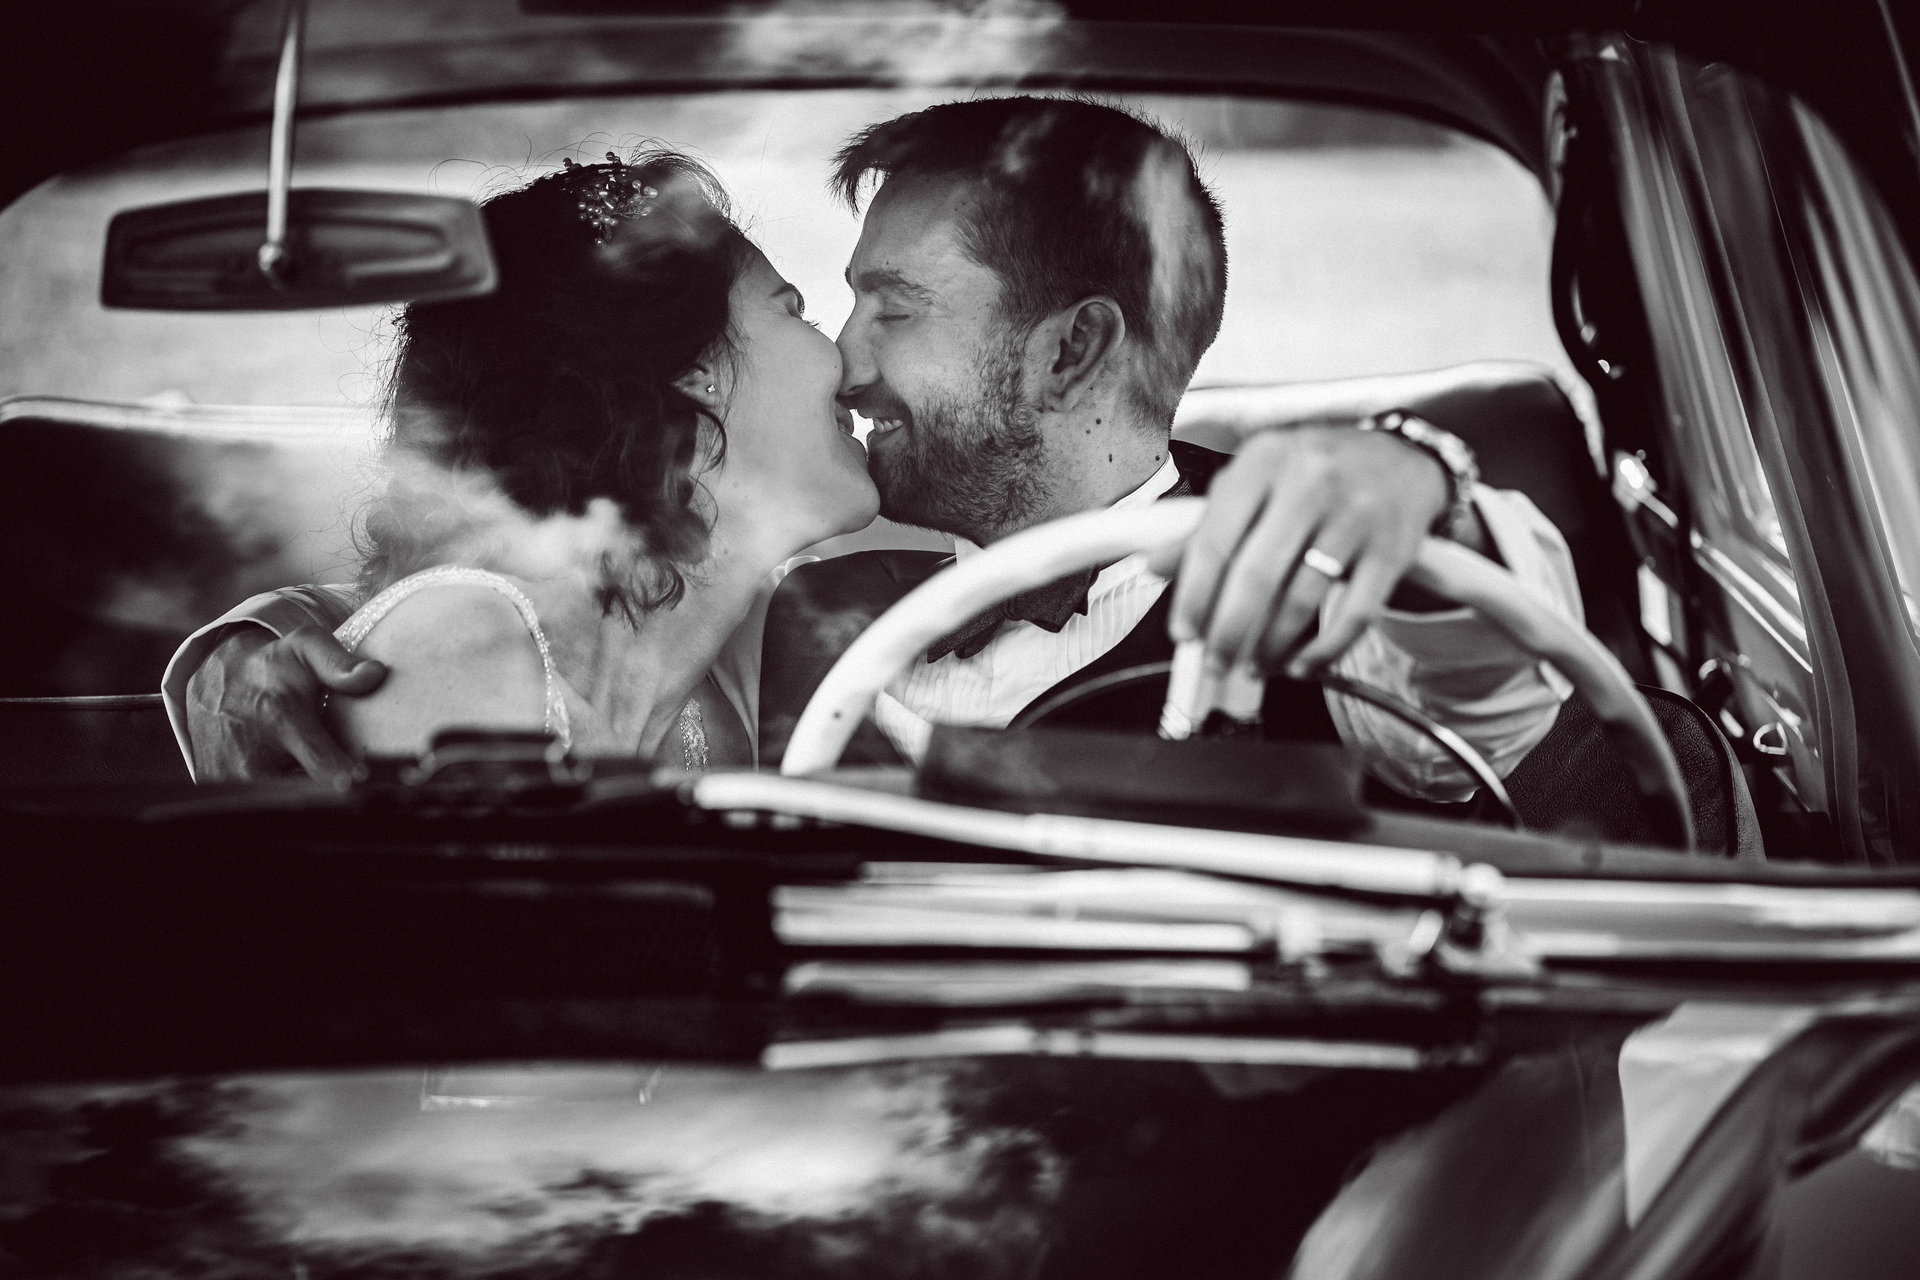 Photo in Wedding | Author shocolad | PHOTO FORUM